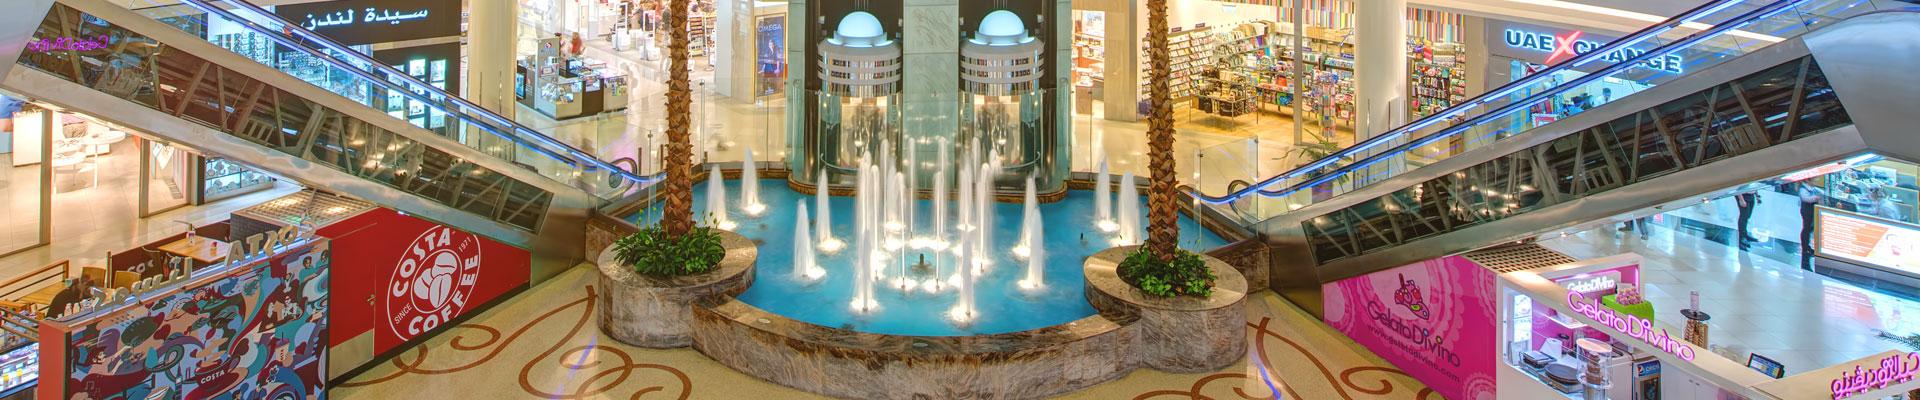 Etisalat | Mega Mall